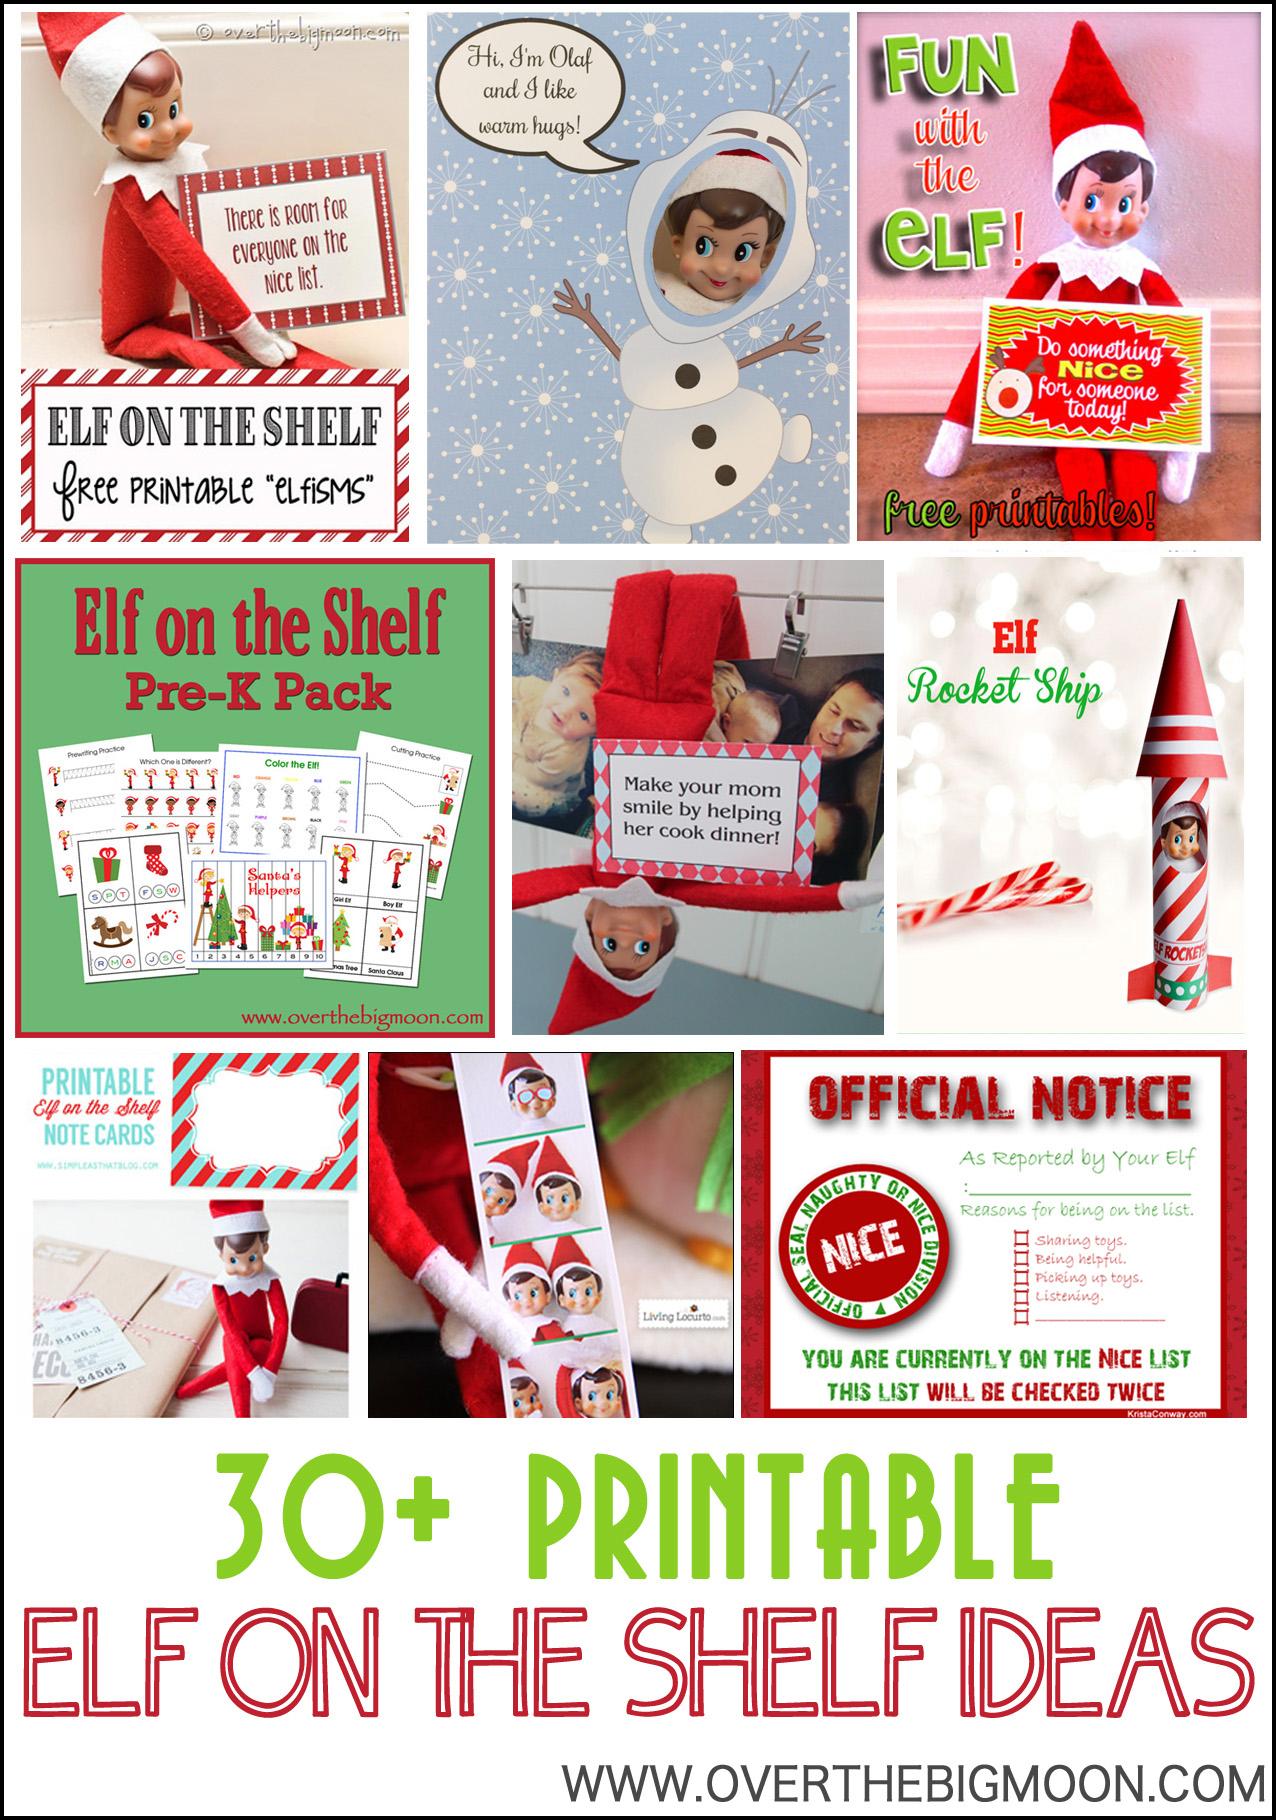 30+ Printable Elf On The Shelf Ideas - Over The Big Moon - Elf On The Shelf Kissing Booth Free Printable